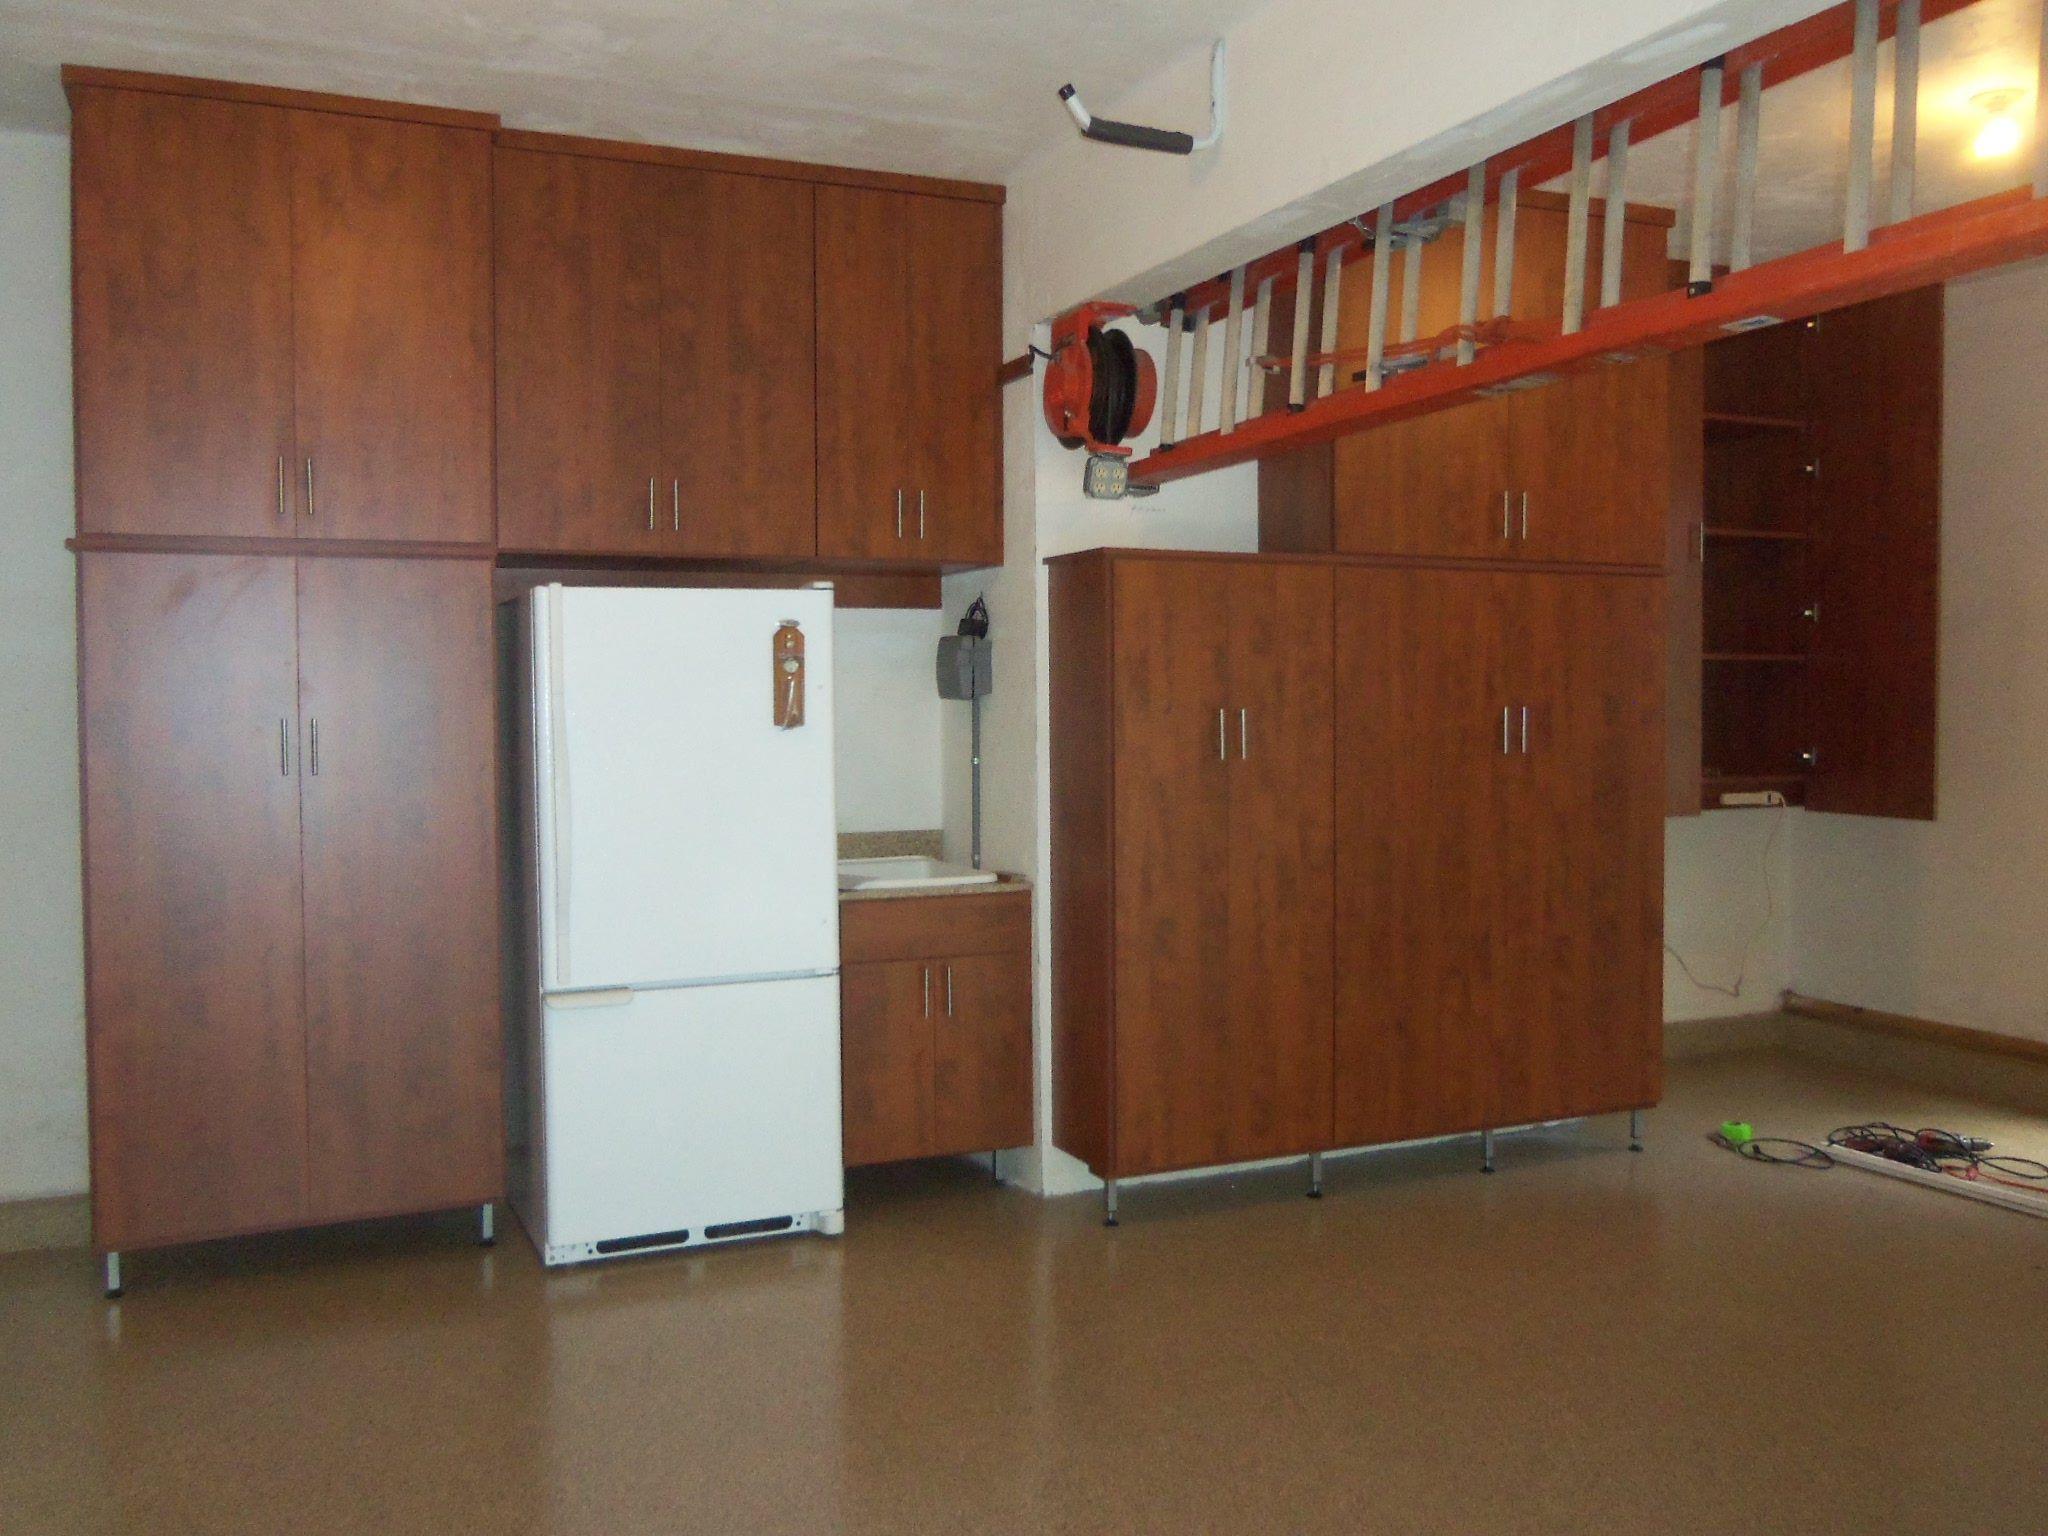 Custom garage cabinets in dark wood